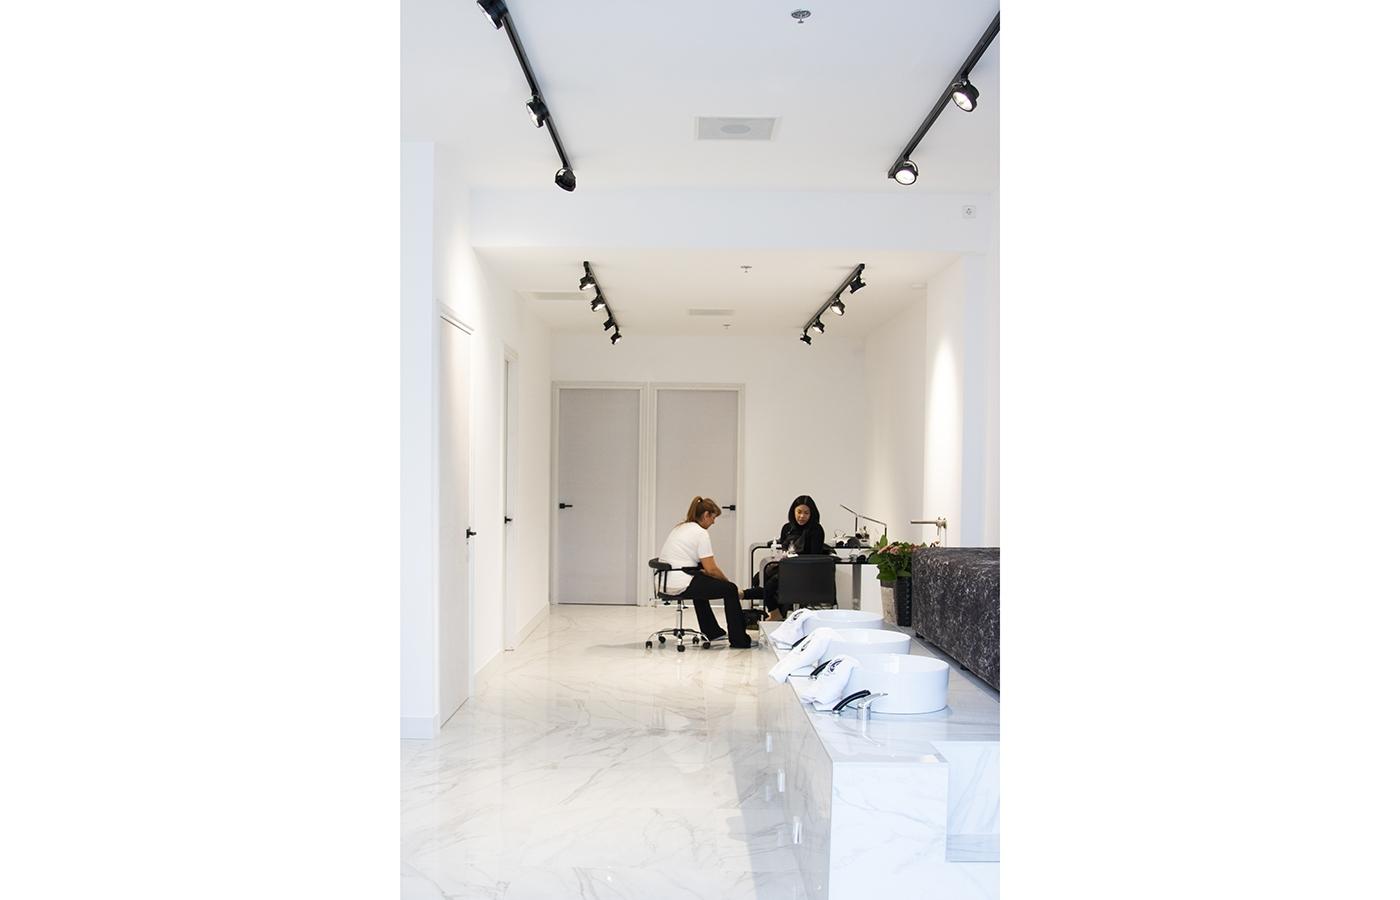 LEDSign project: Bella Beauthy studio